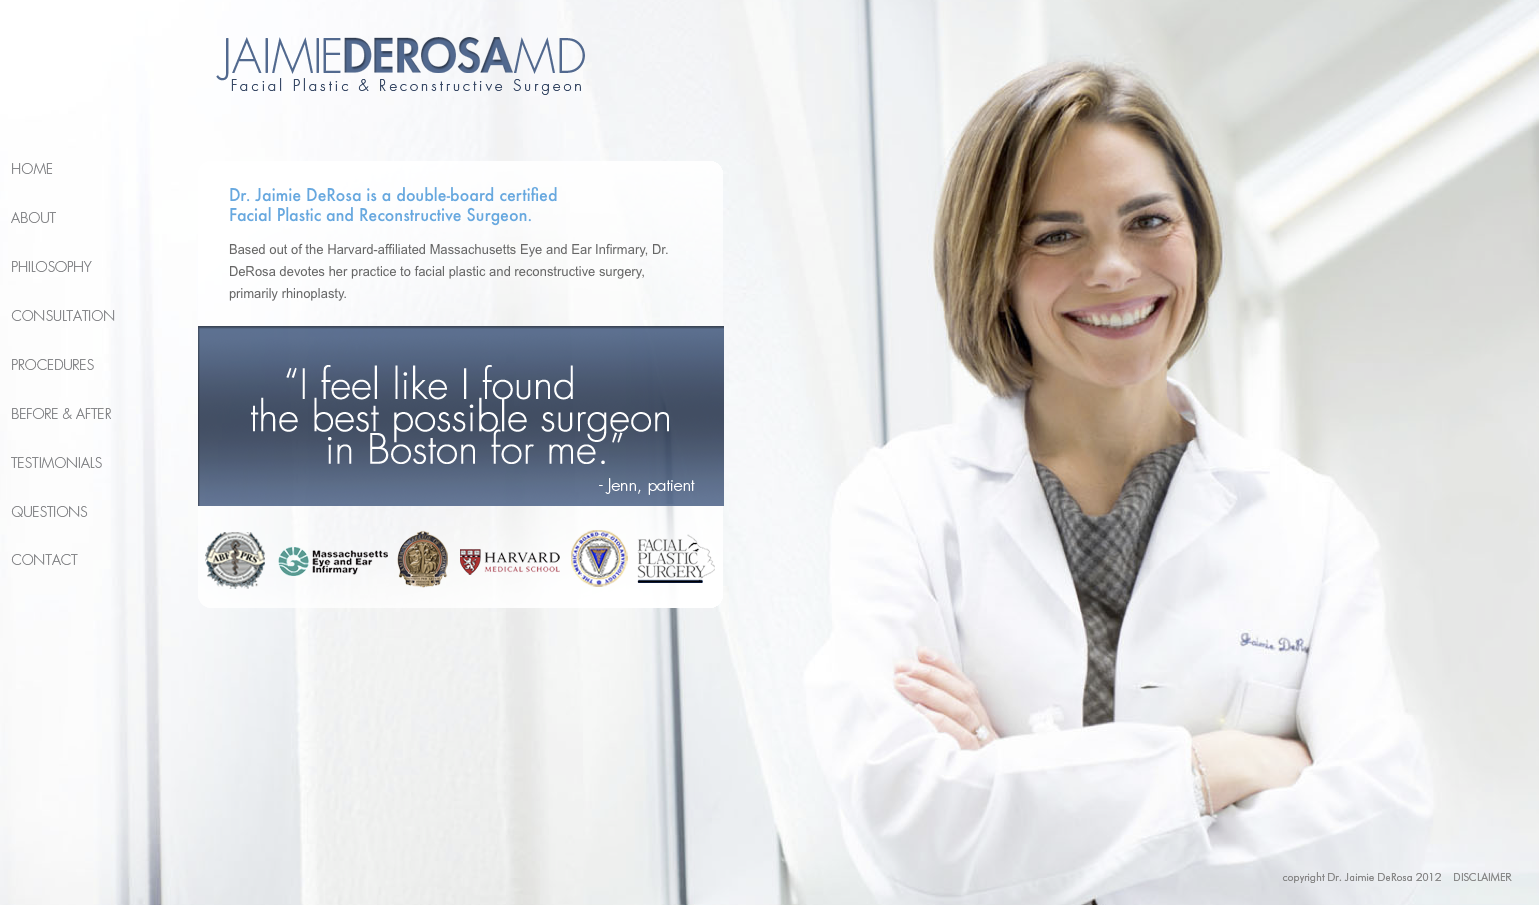 Dr Jamie DeRosa, plastic surgeon